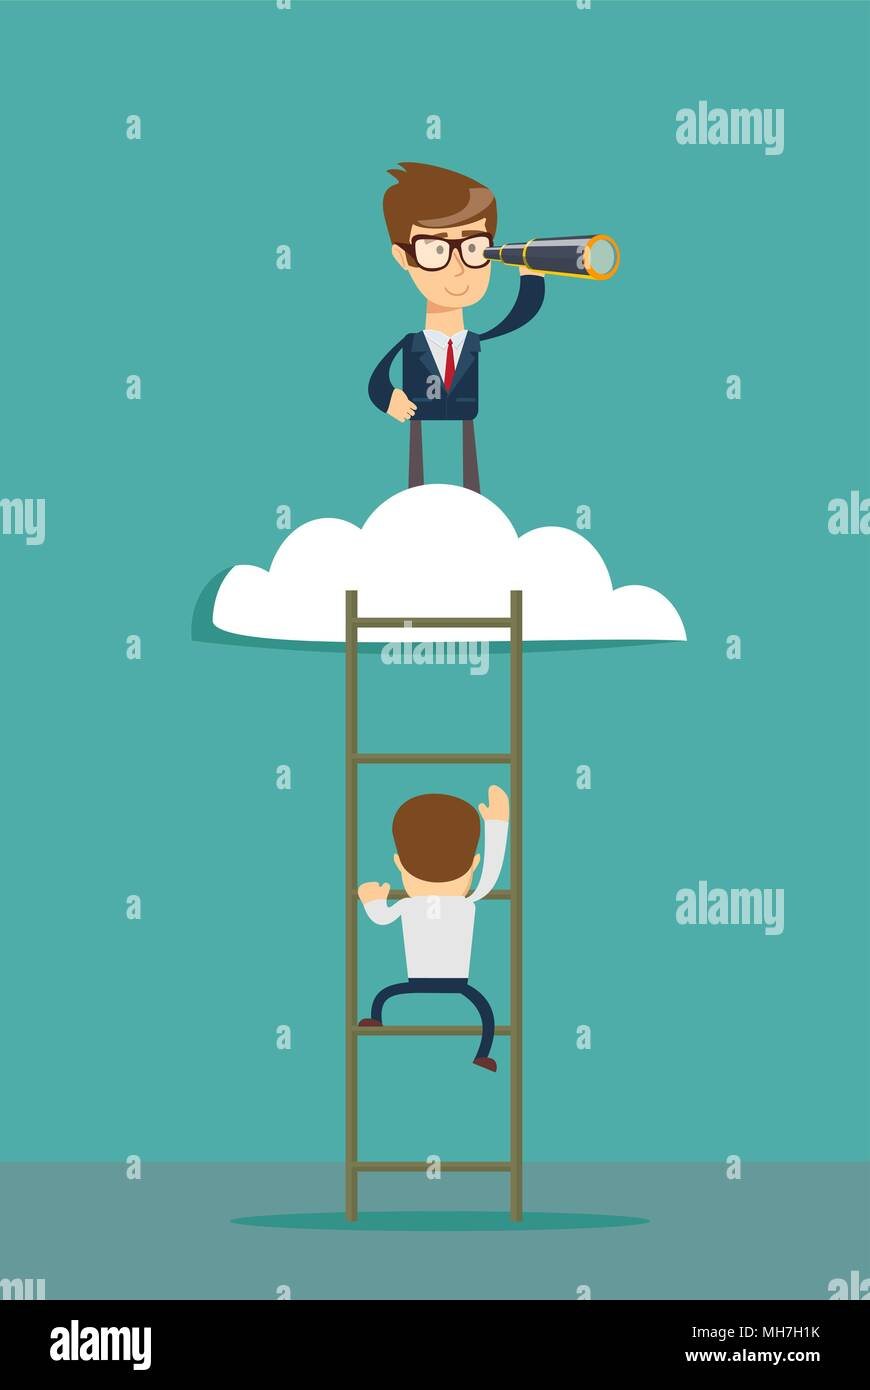 Concepto vectorial de liderazgo empresarial Imagen De Stock